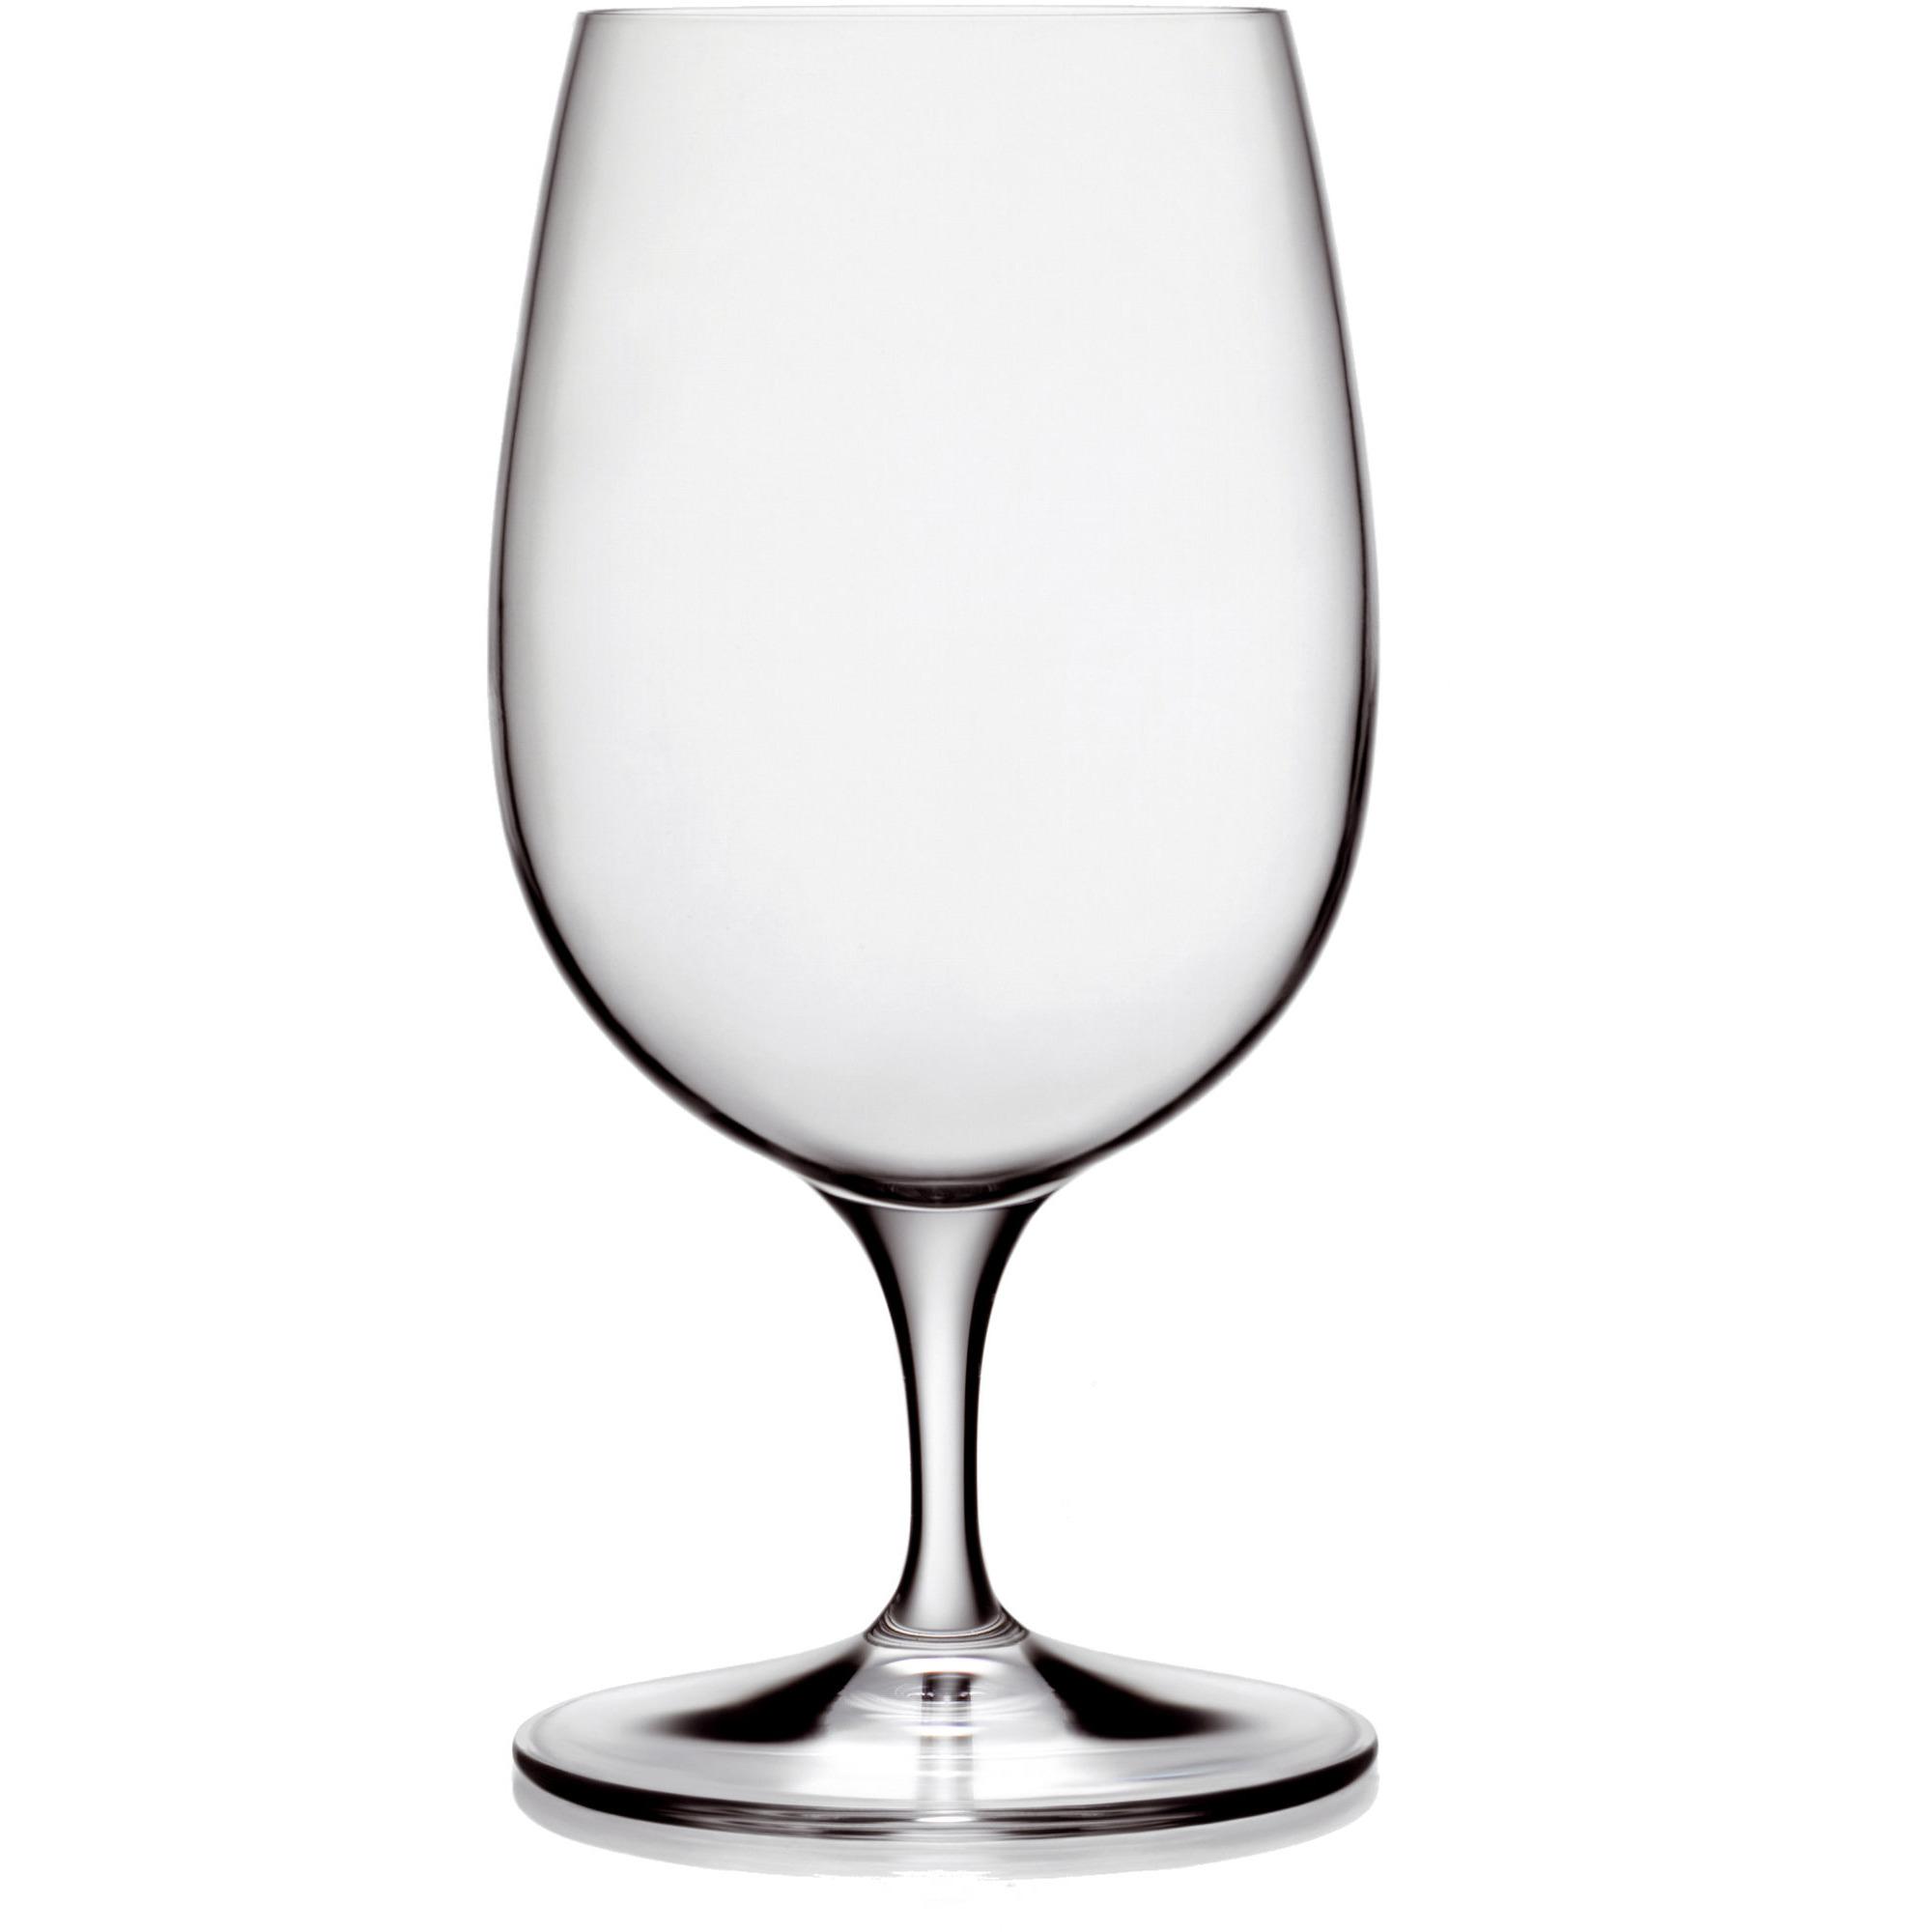 Luigi Bormioli Palace vattenglas 32 cl. 6 st.